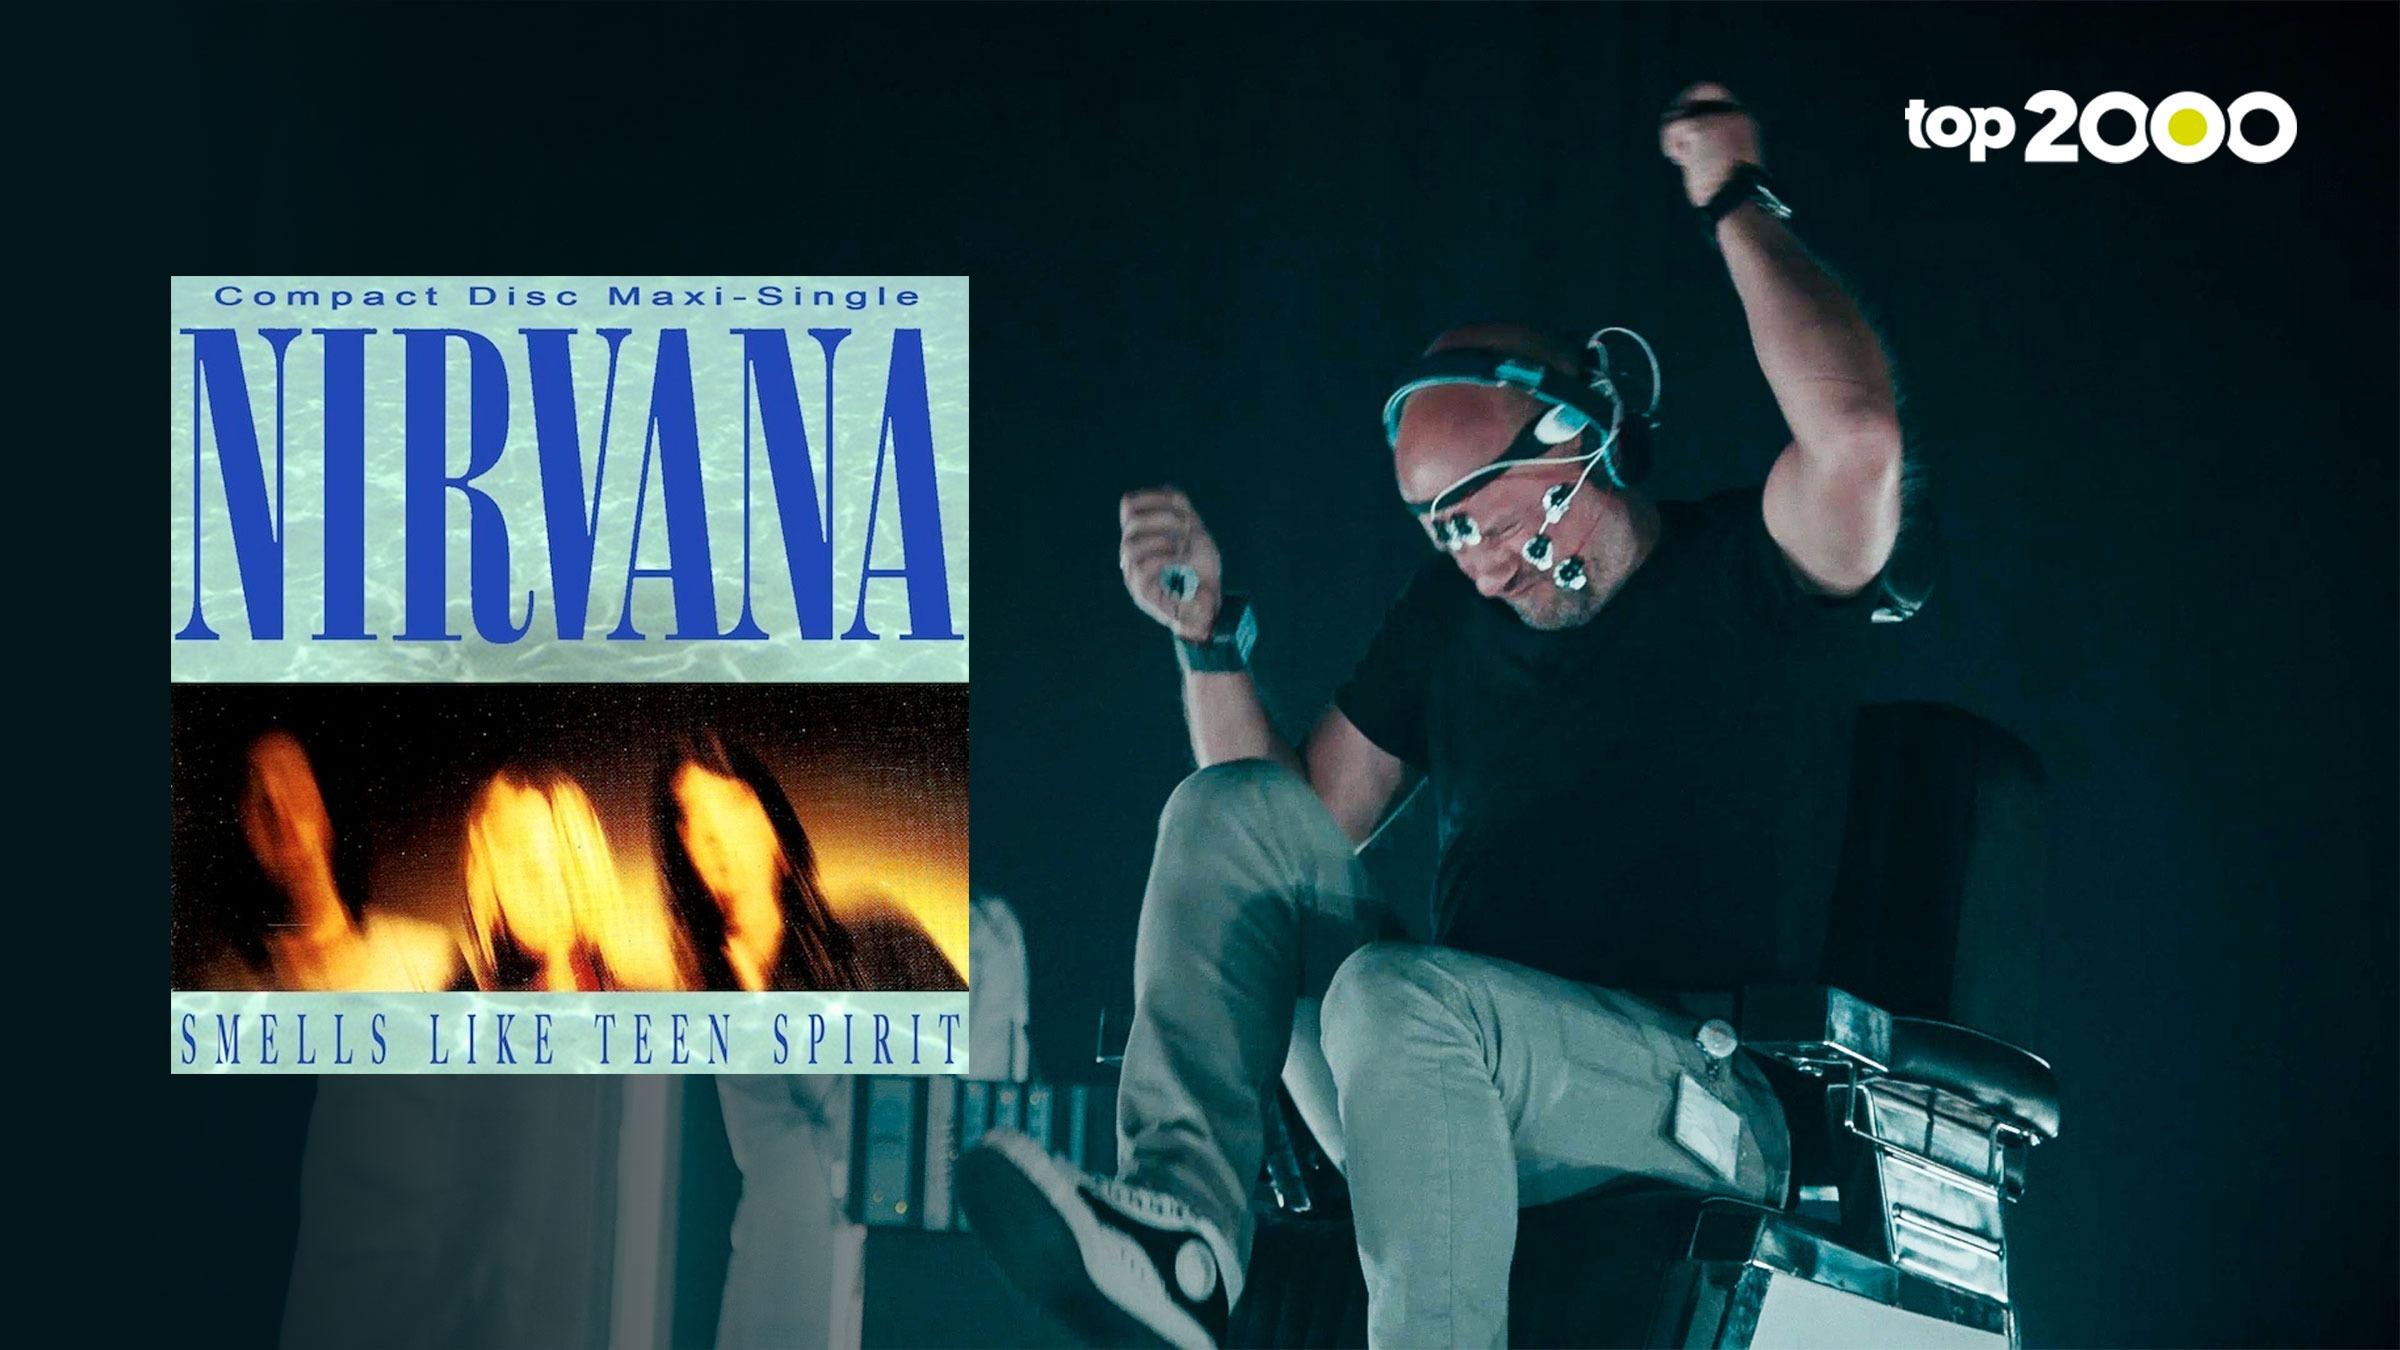 Joe t2000 nirvana